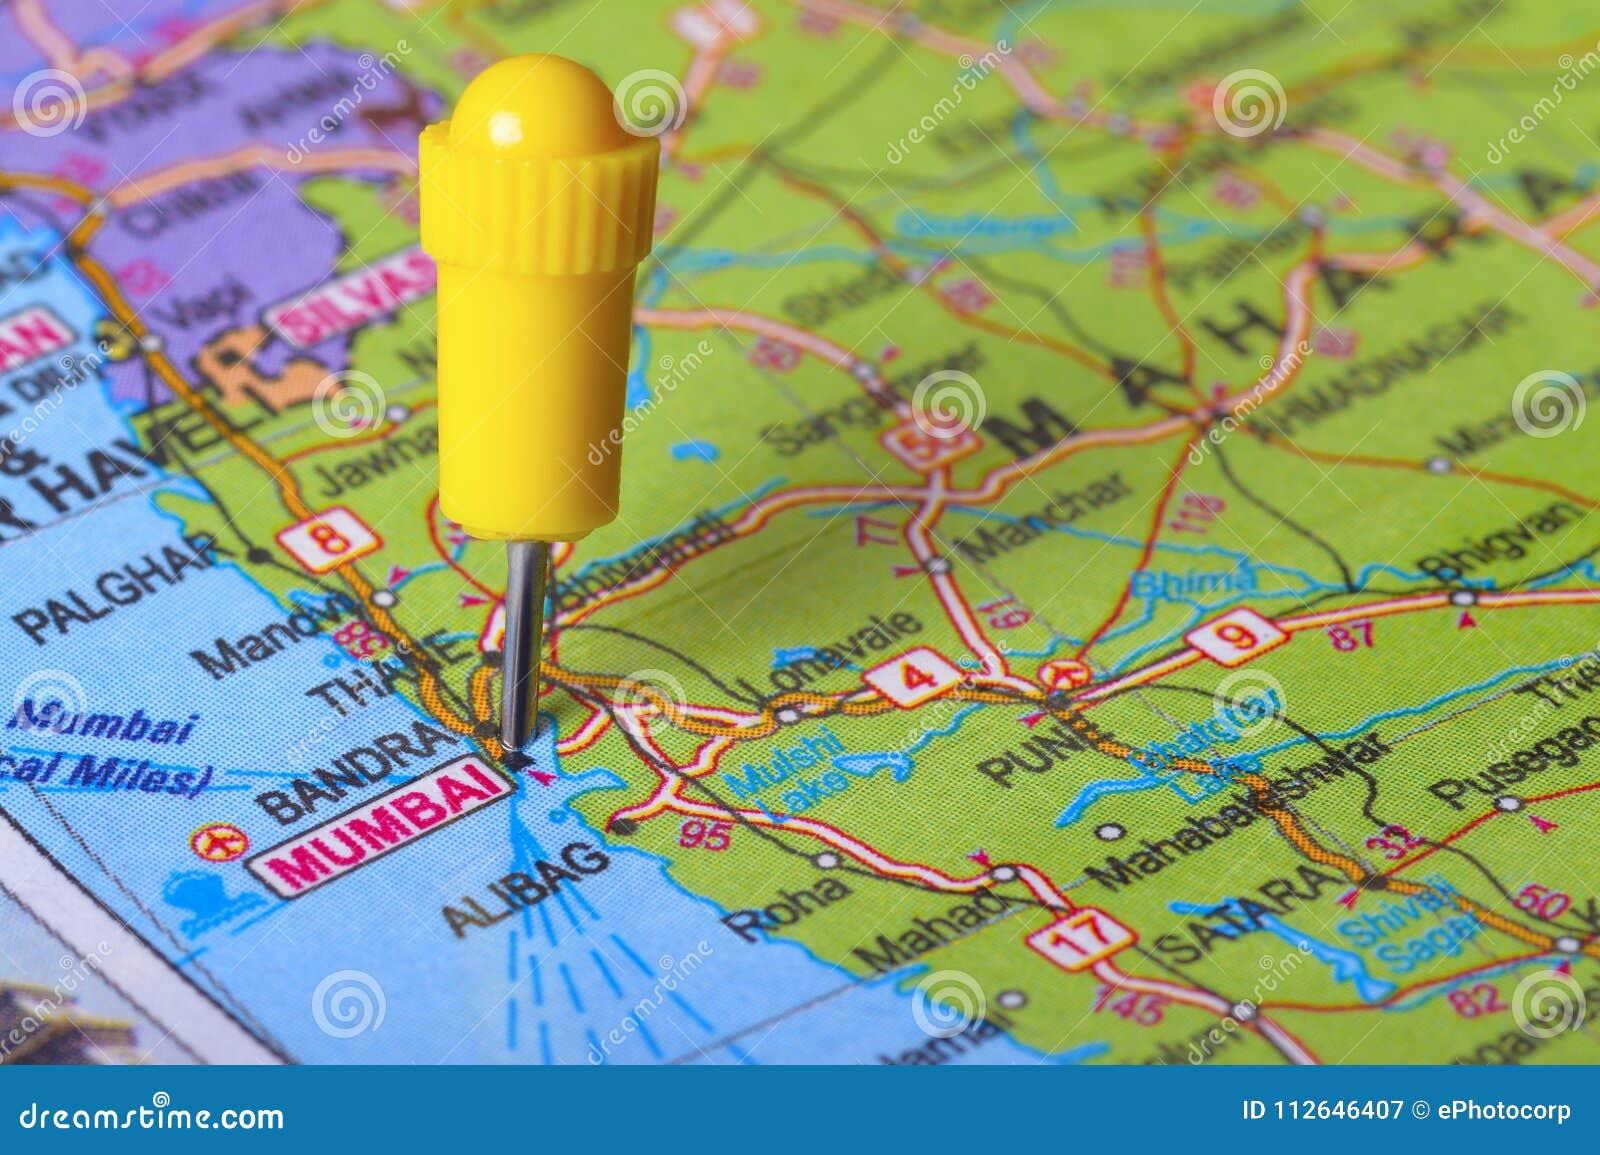 Mumbai On Map Of India.Pushpin Pointing To Mumbai On A Map Of India Stock Image Image Of